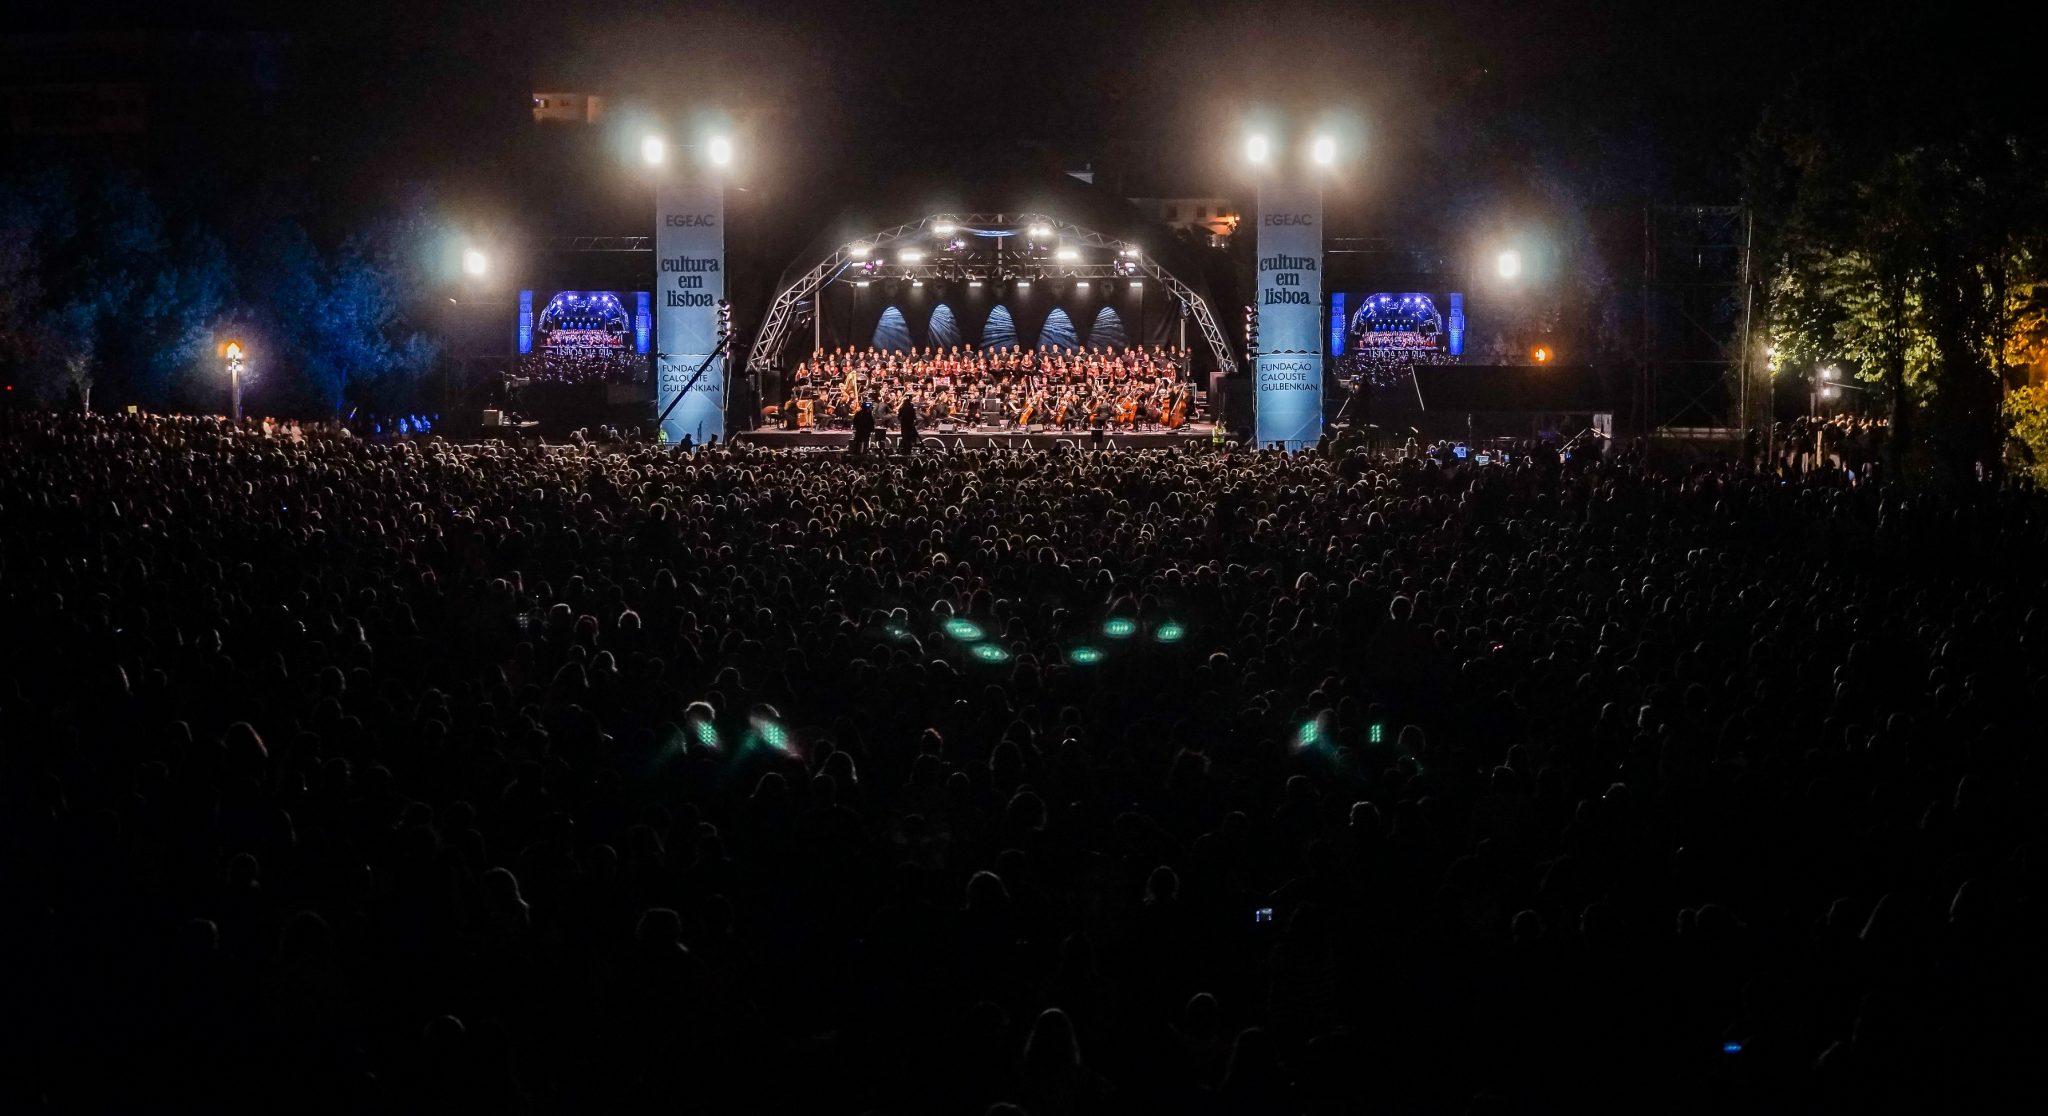 Público de costas para o observador, virado para o palco onde estão os músicos e os cantores do Coro e Orquestra Gulbenkian